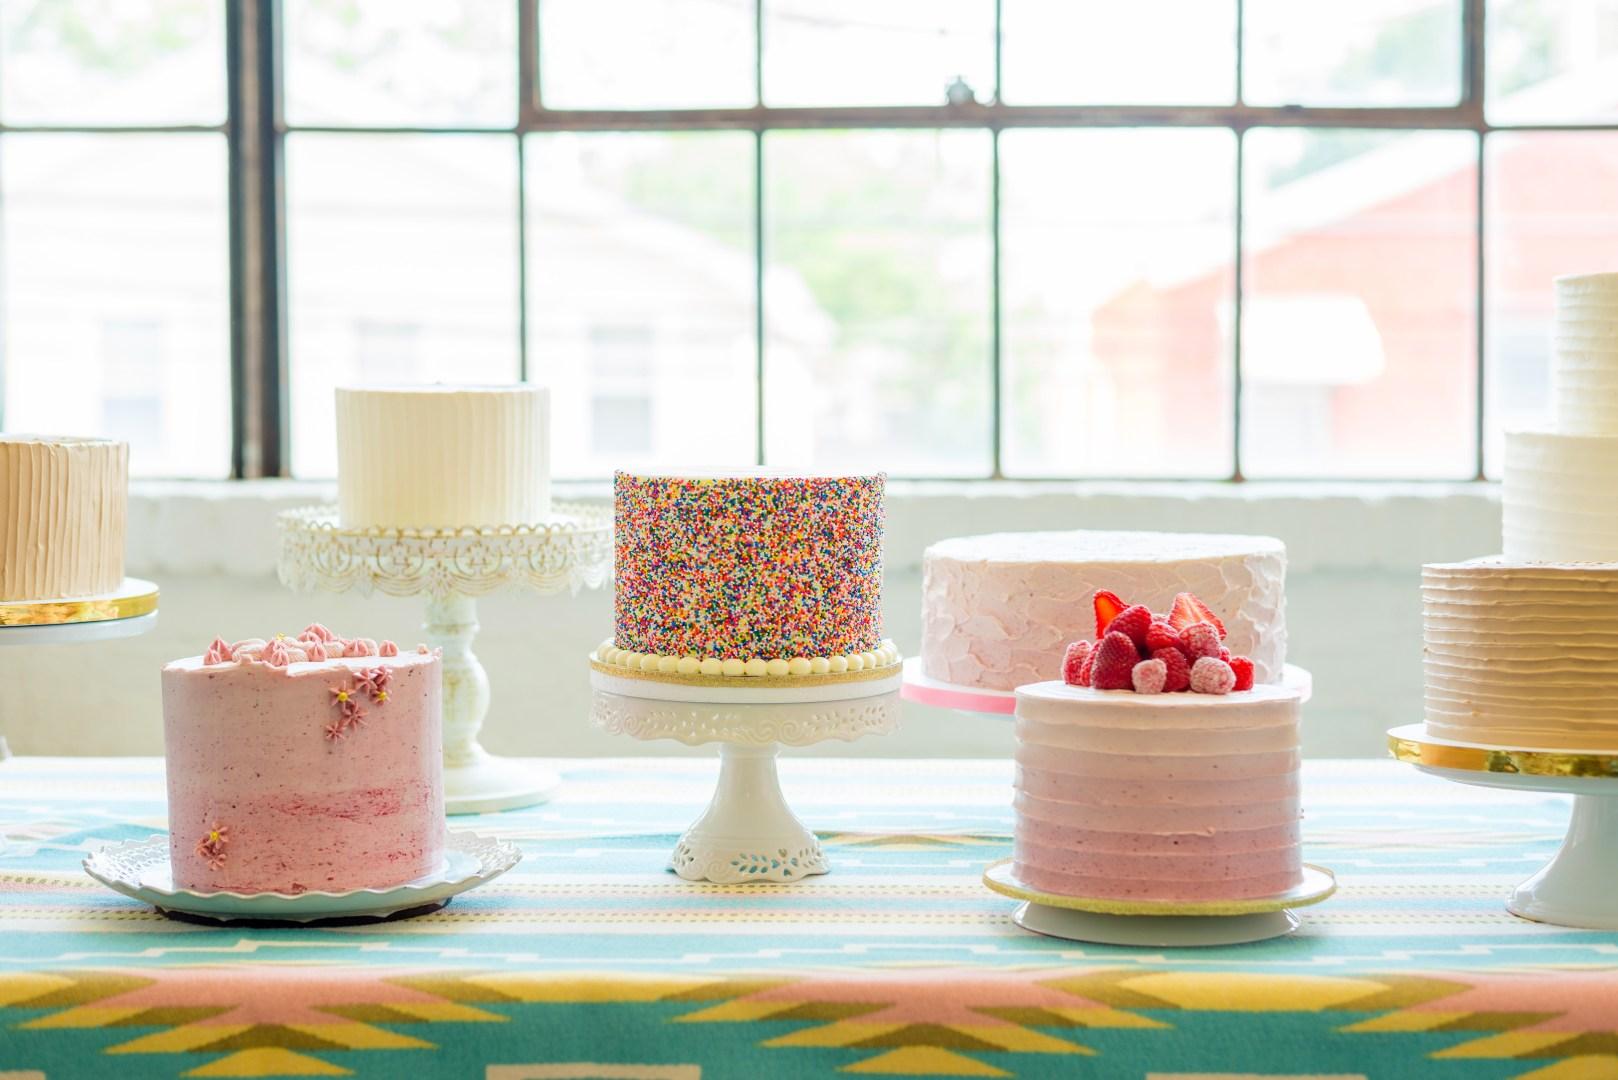 cake life bake shop